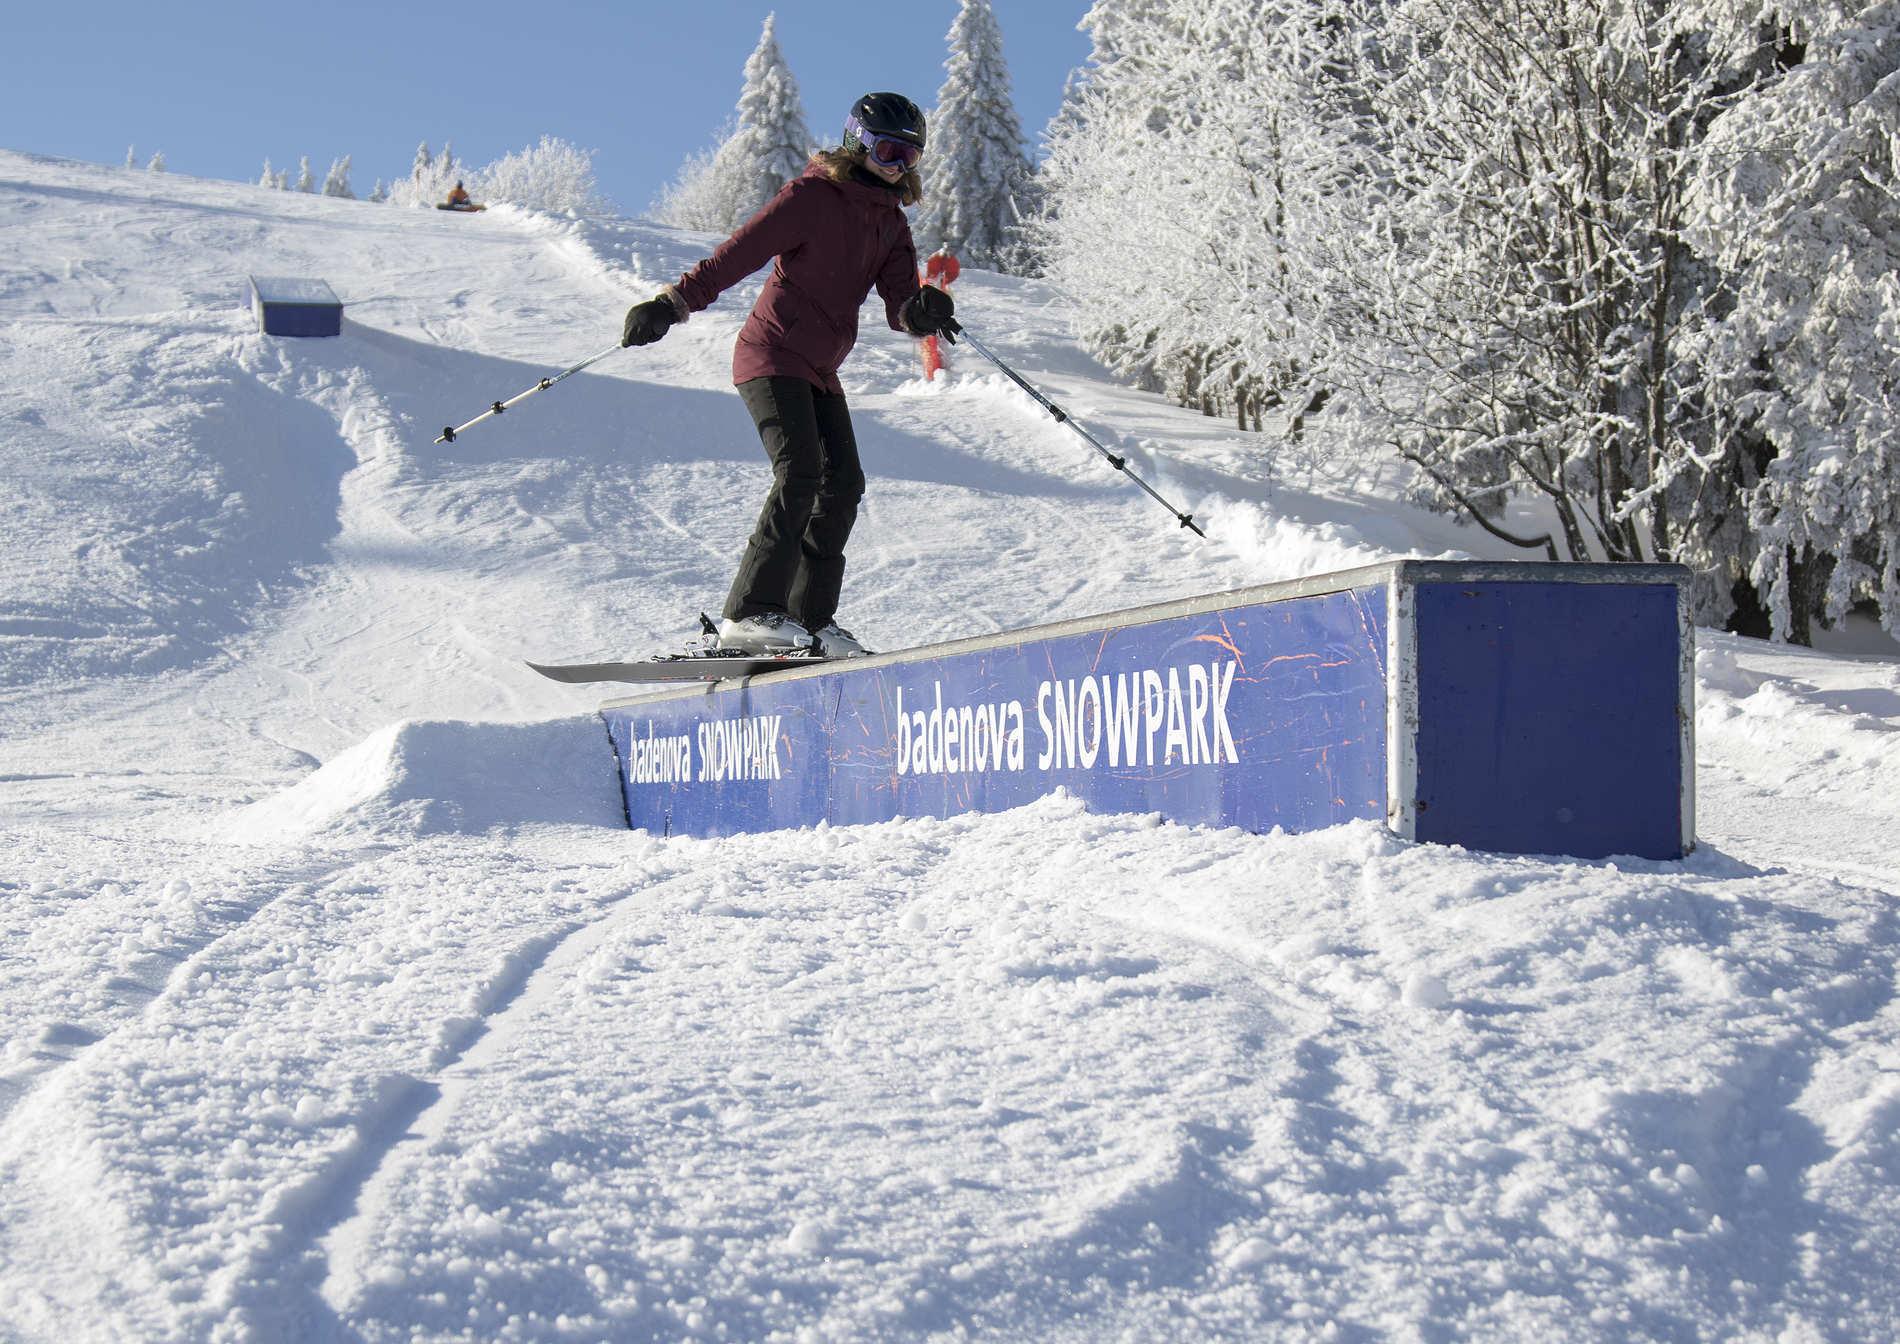 snowpark feldberg 24 02 2018 action fs unknown martin herrmann qparks 1